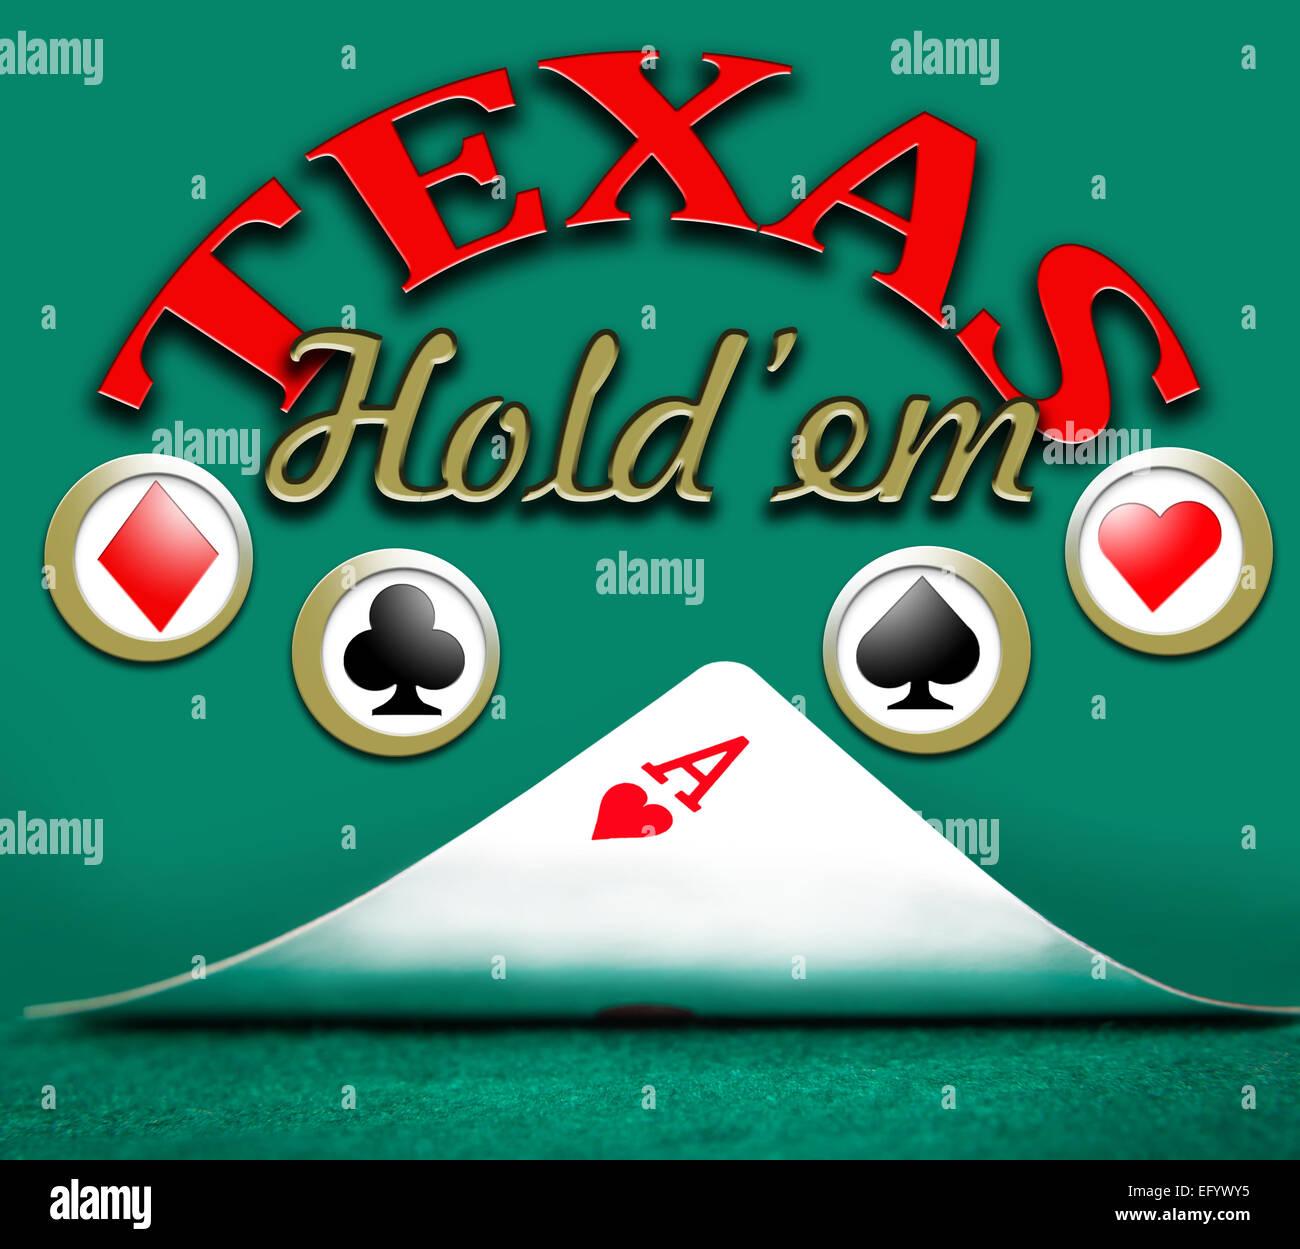 poker texas holdem, gambling background - Stock Image